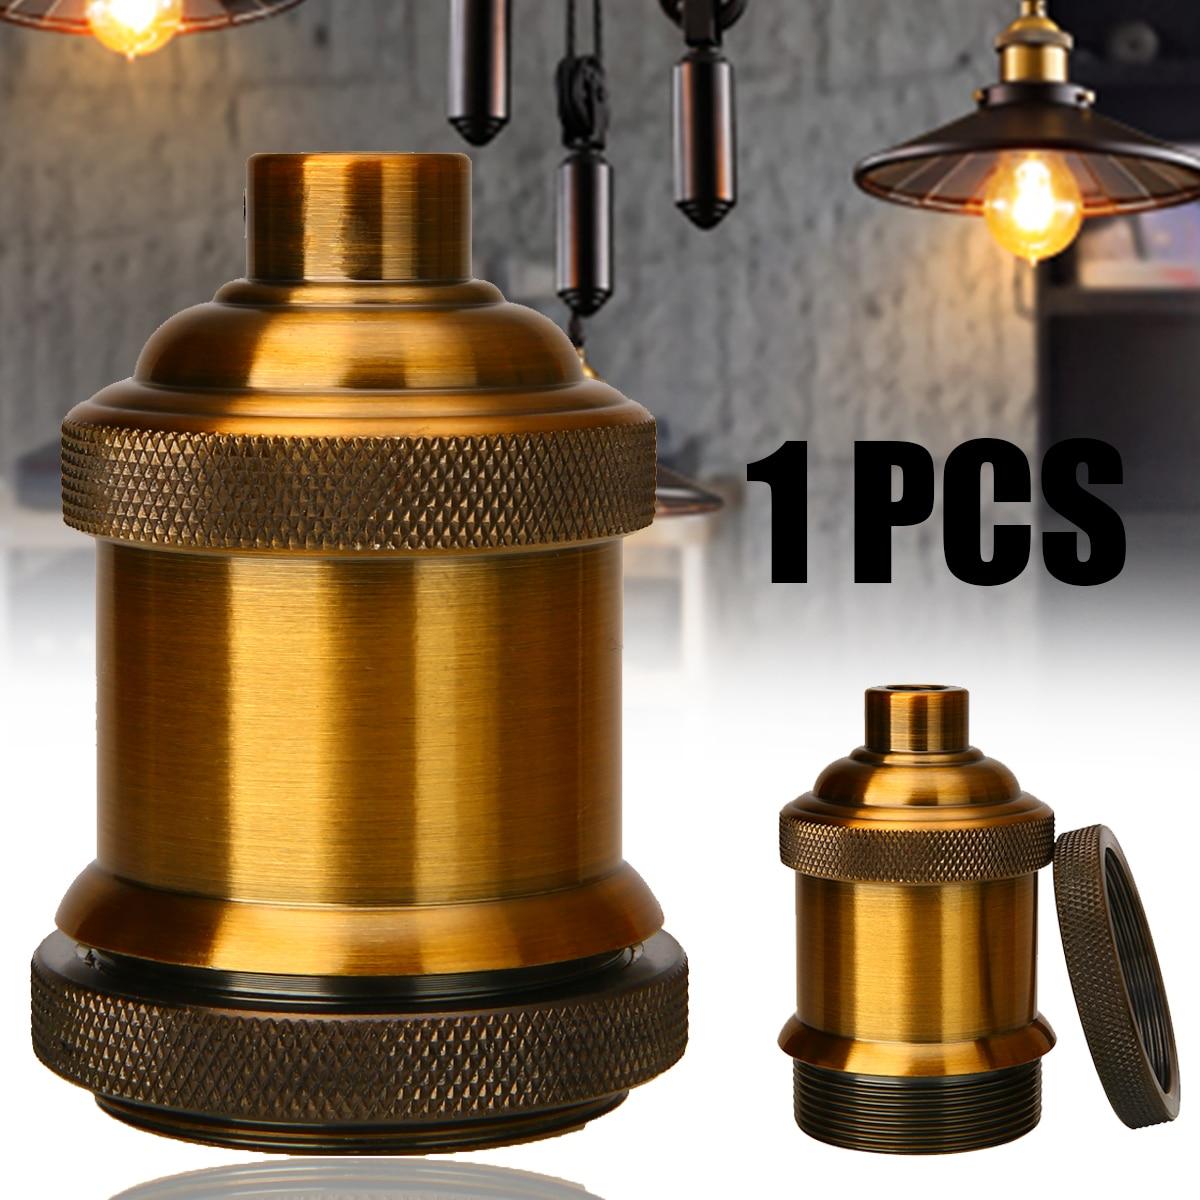 1pcs Vintage Screw Aluminum Light Socket Keyless Lamp Base Holder E26/E27 Bulbs Light Holder Light Accessories Tools Durable